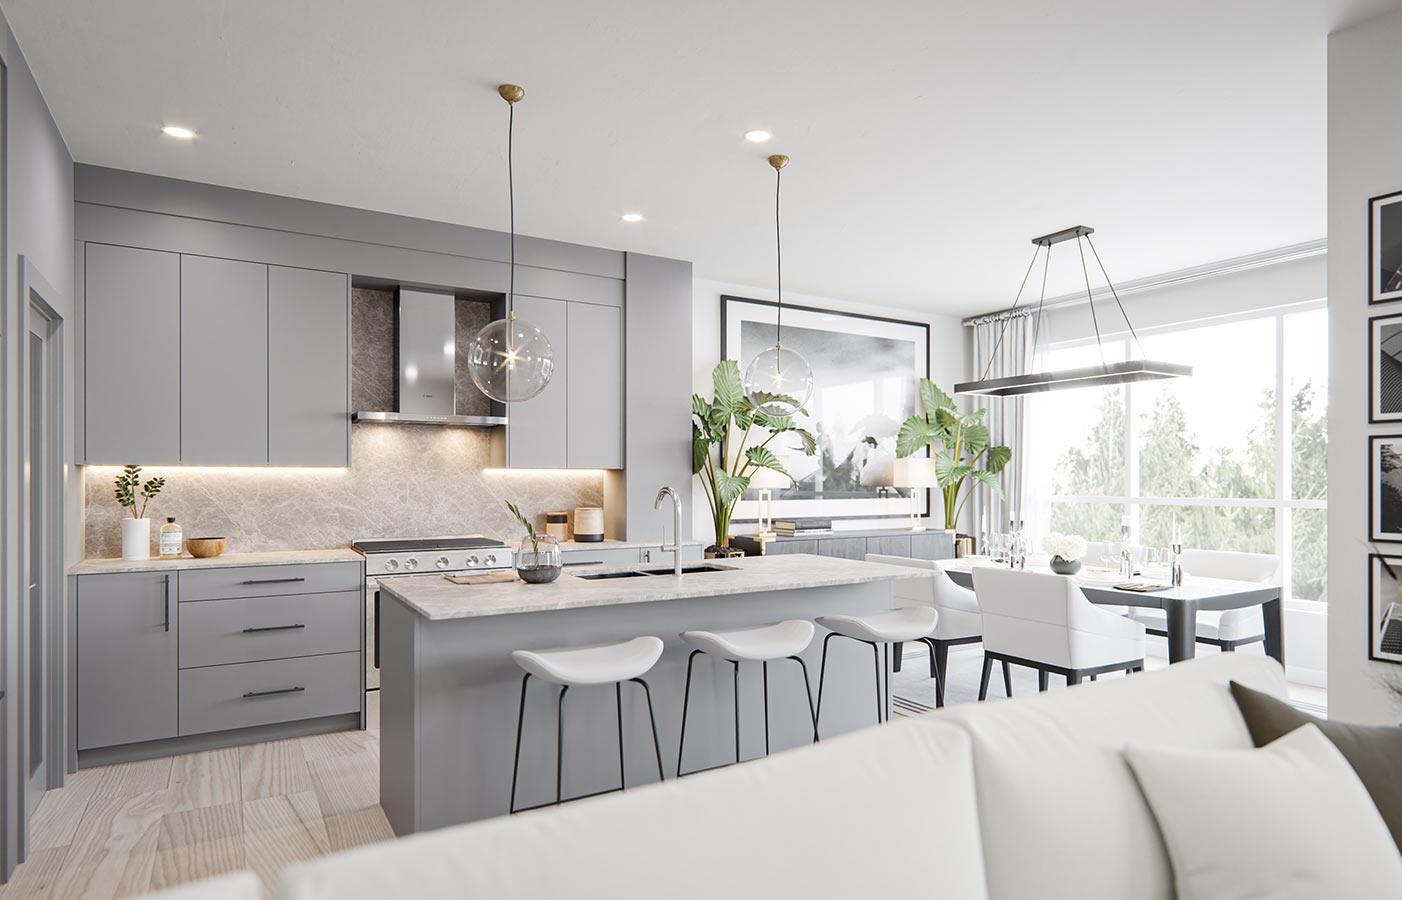 Grey kitchen with Marble style Backsplash & Countertops